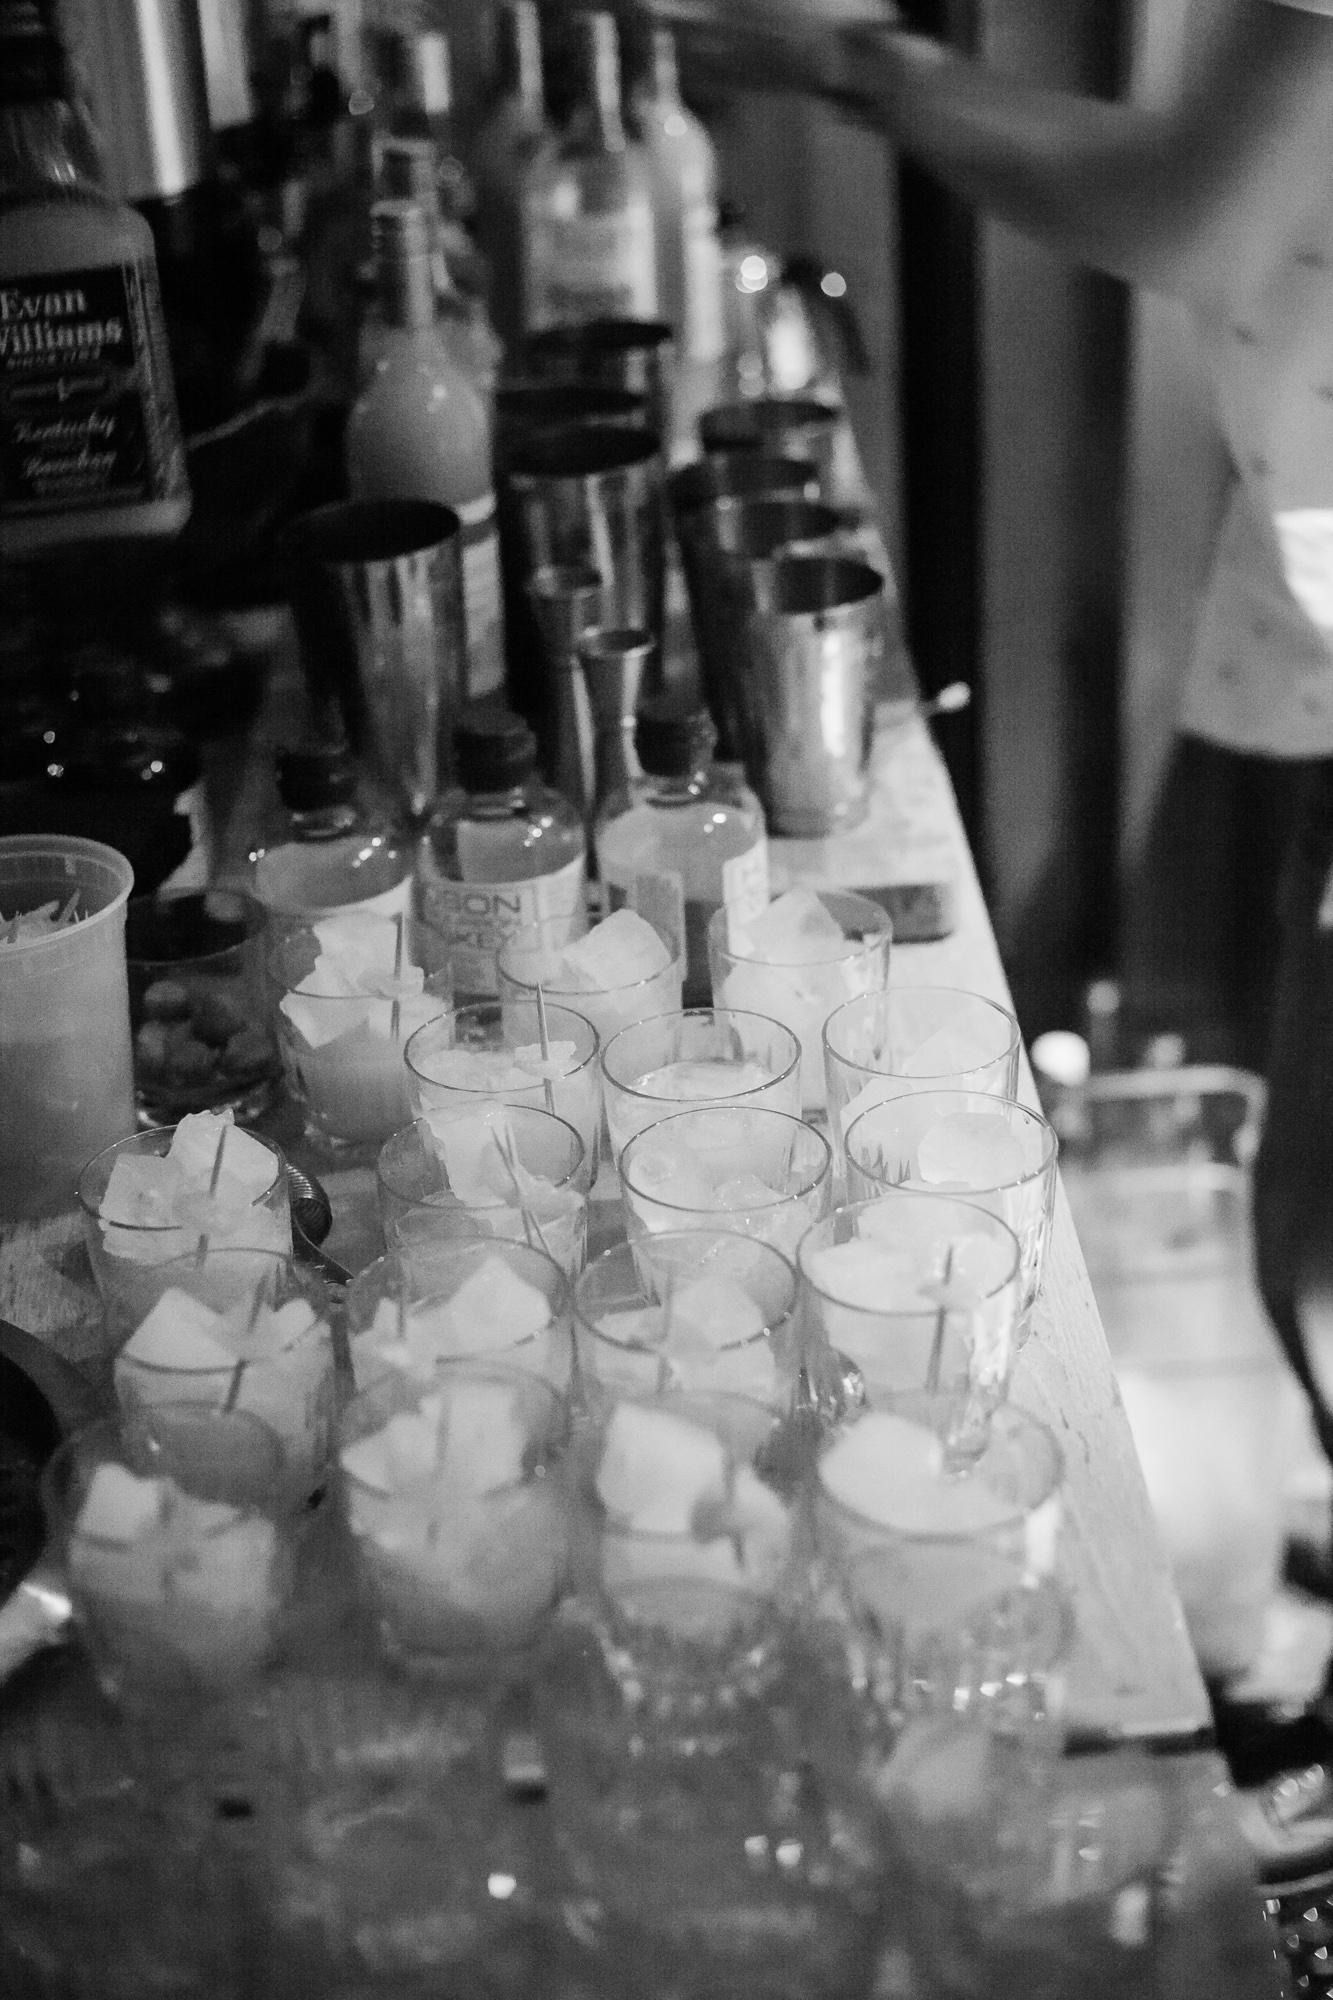 141208_SOFAB_Cocktails_274.jpg